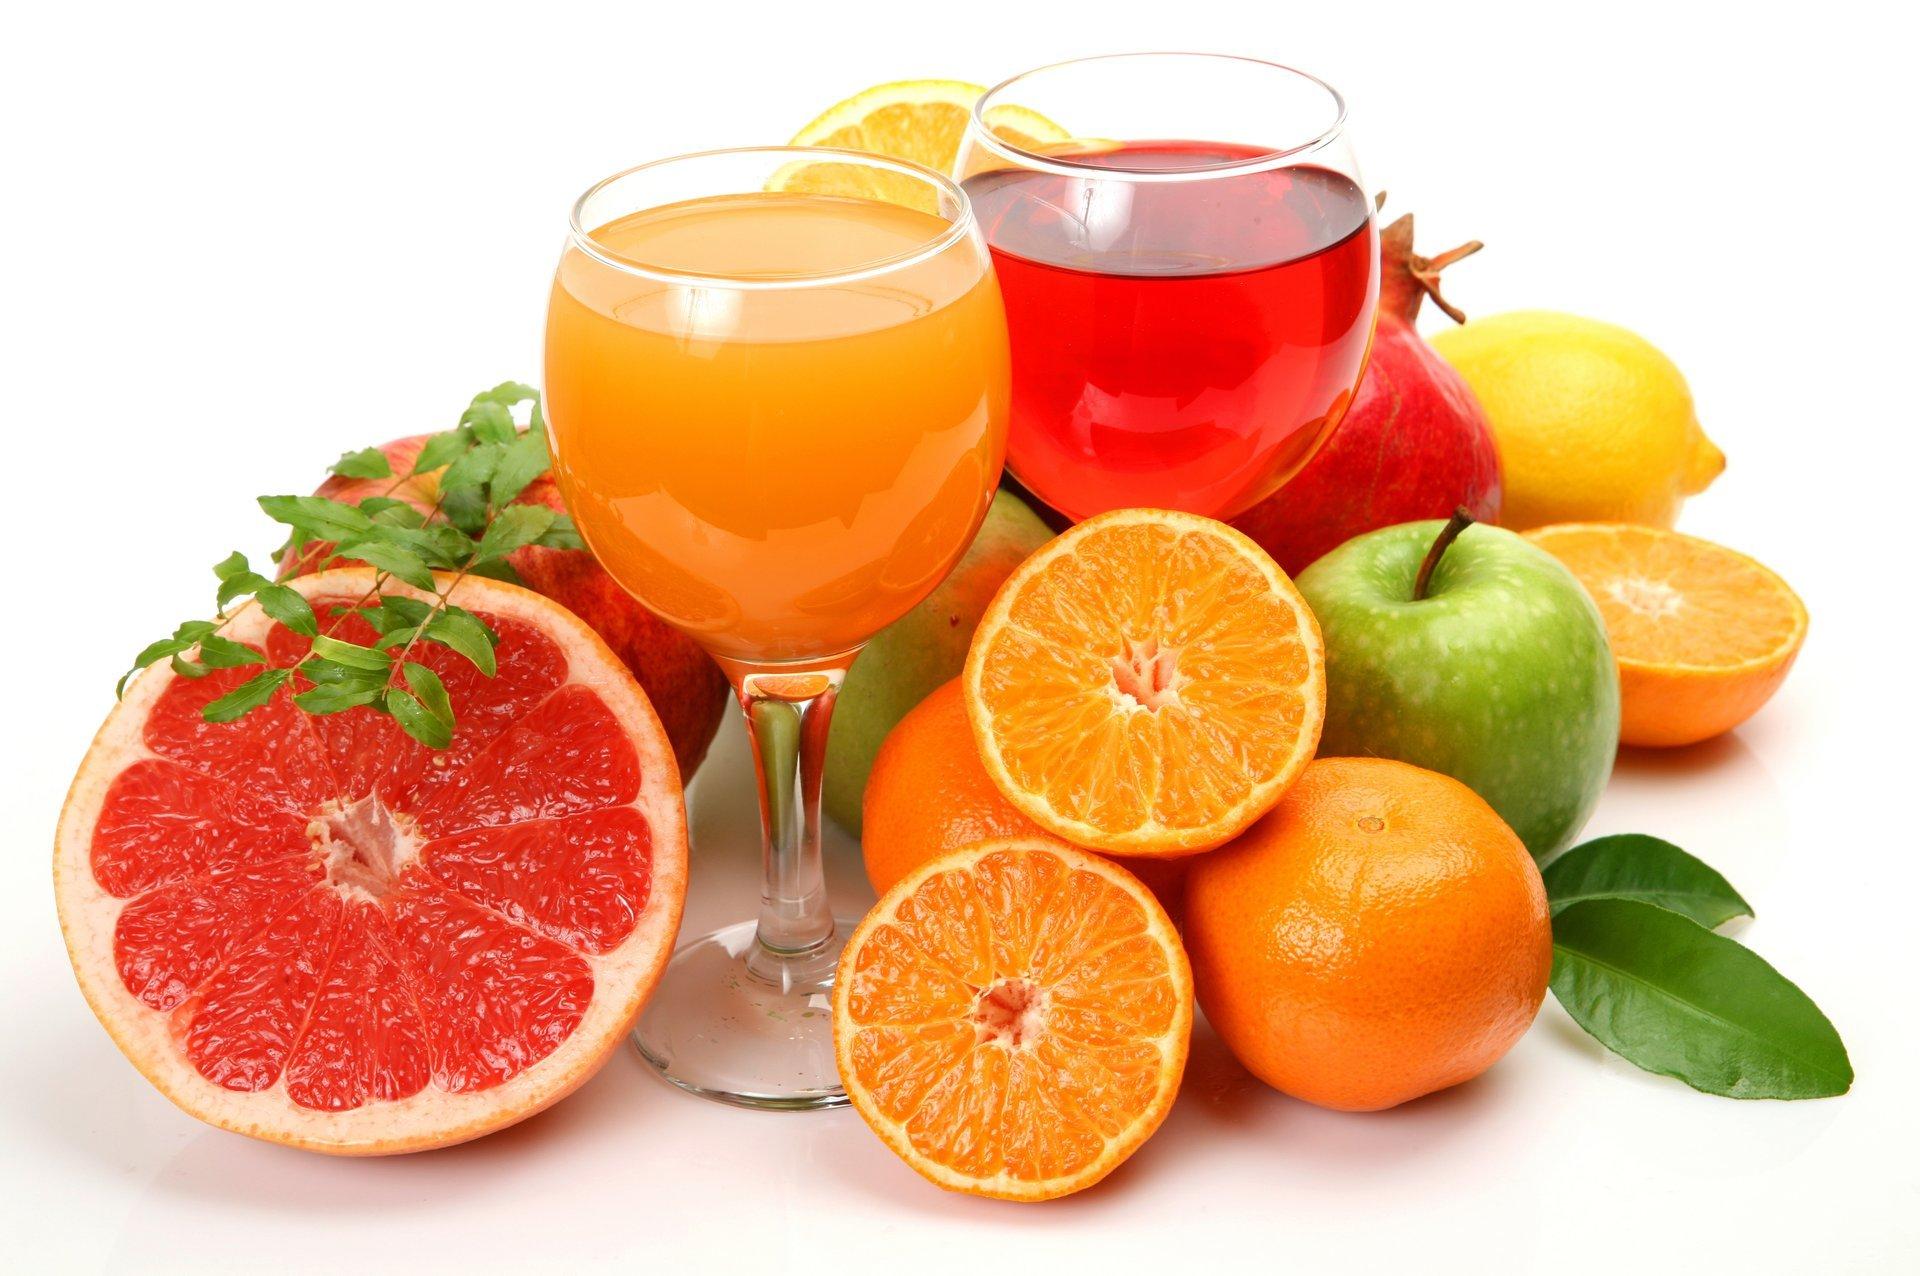 Обои апельсин, цитрусы, виноград, напиток, сок. Еда foto 12